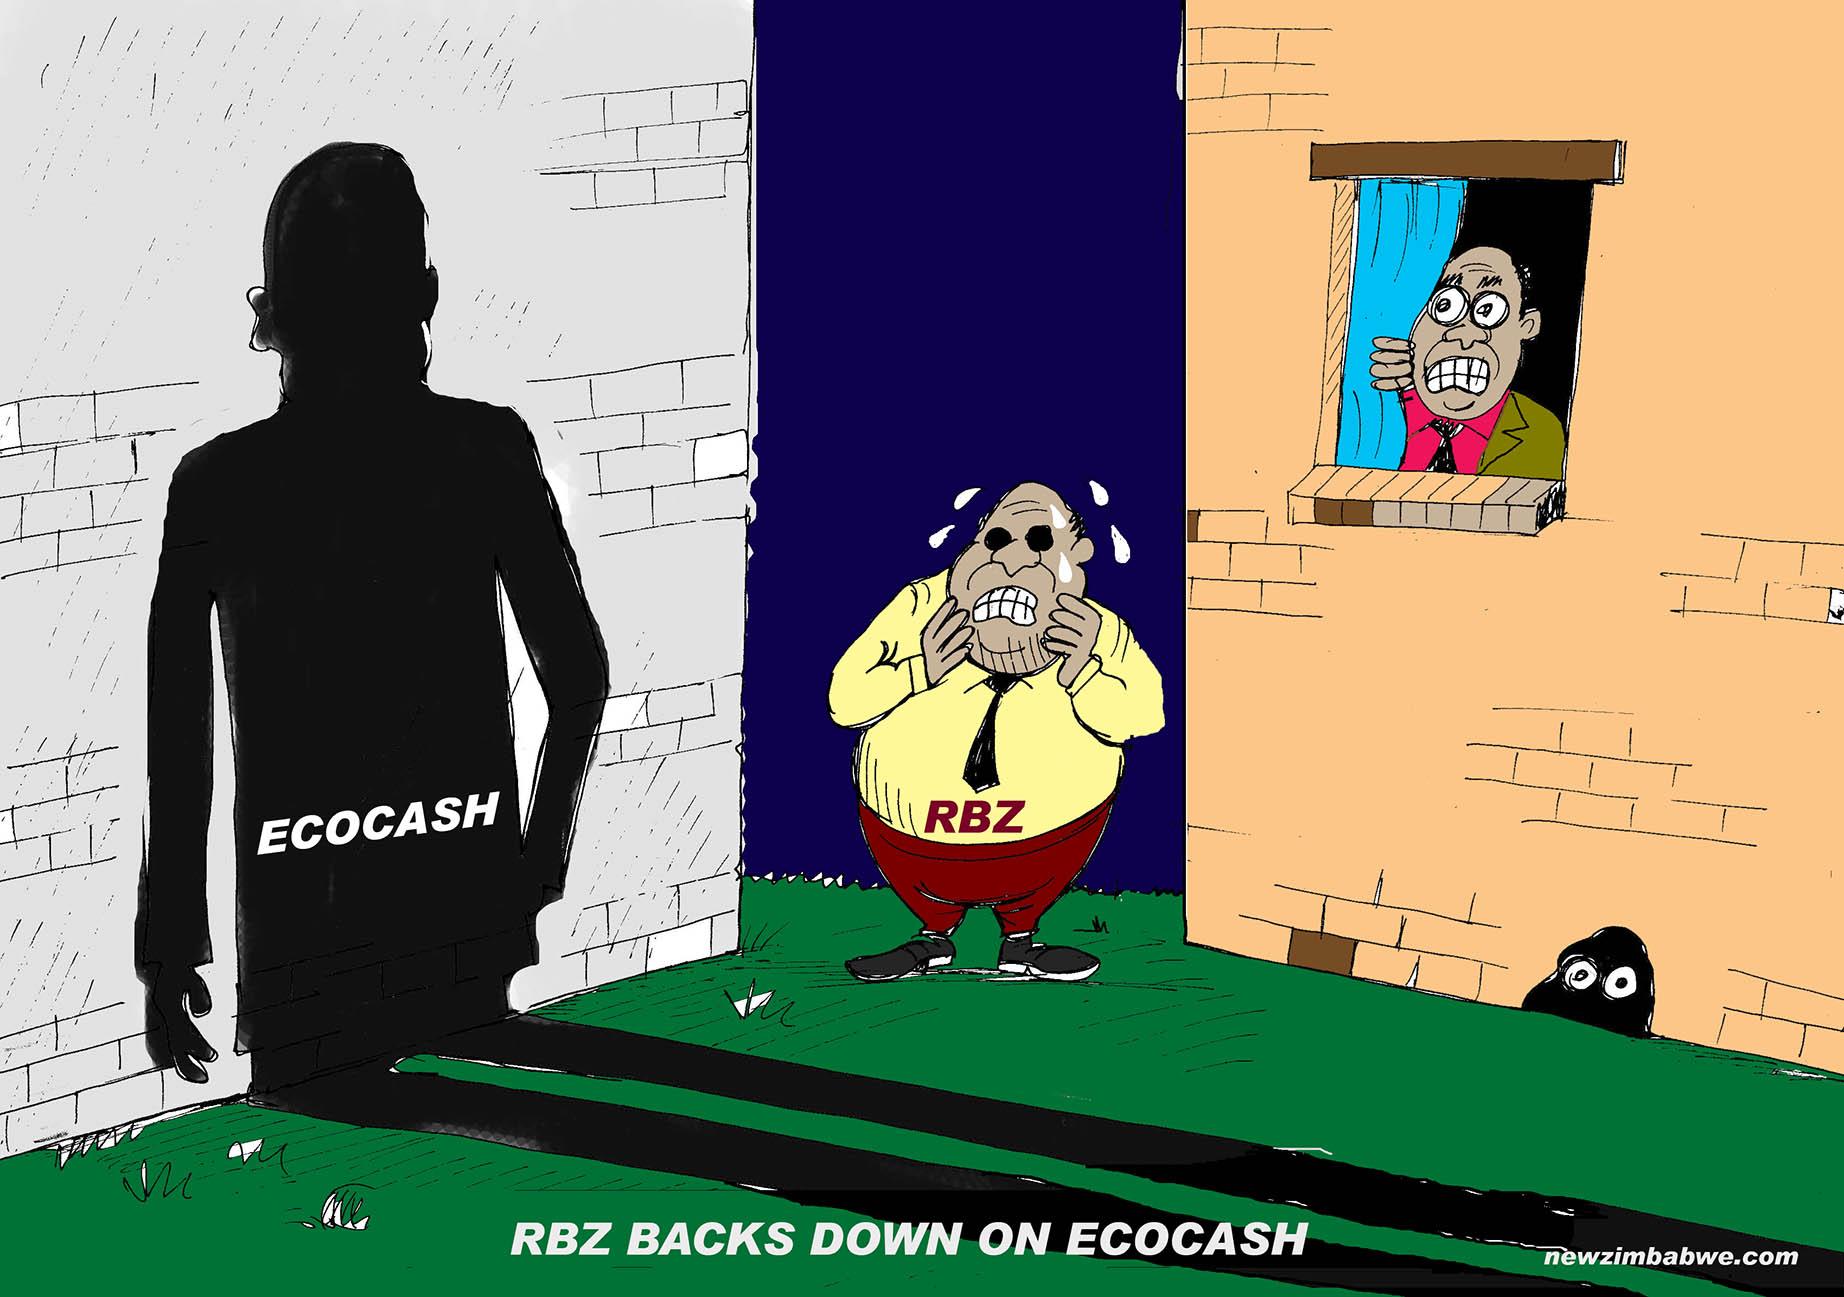 RBZ backs down on Ecocash